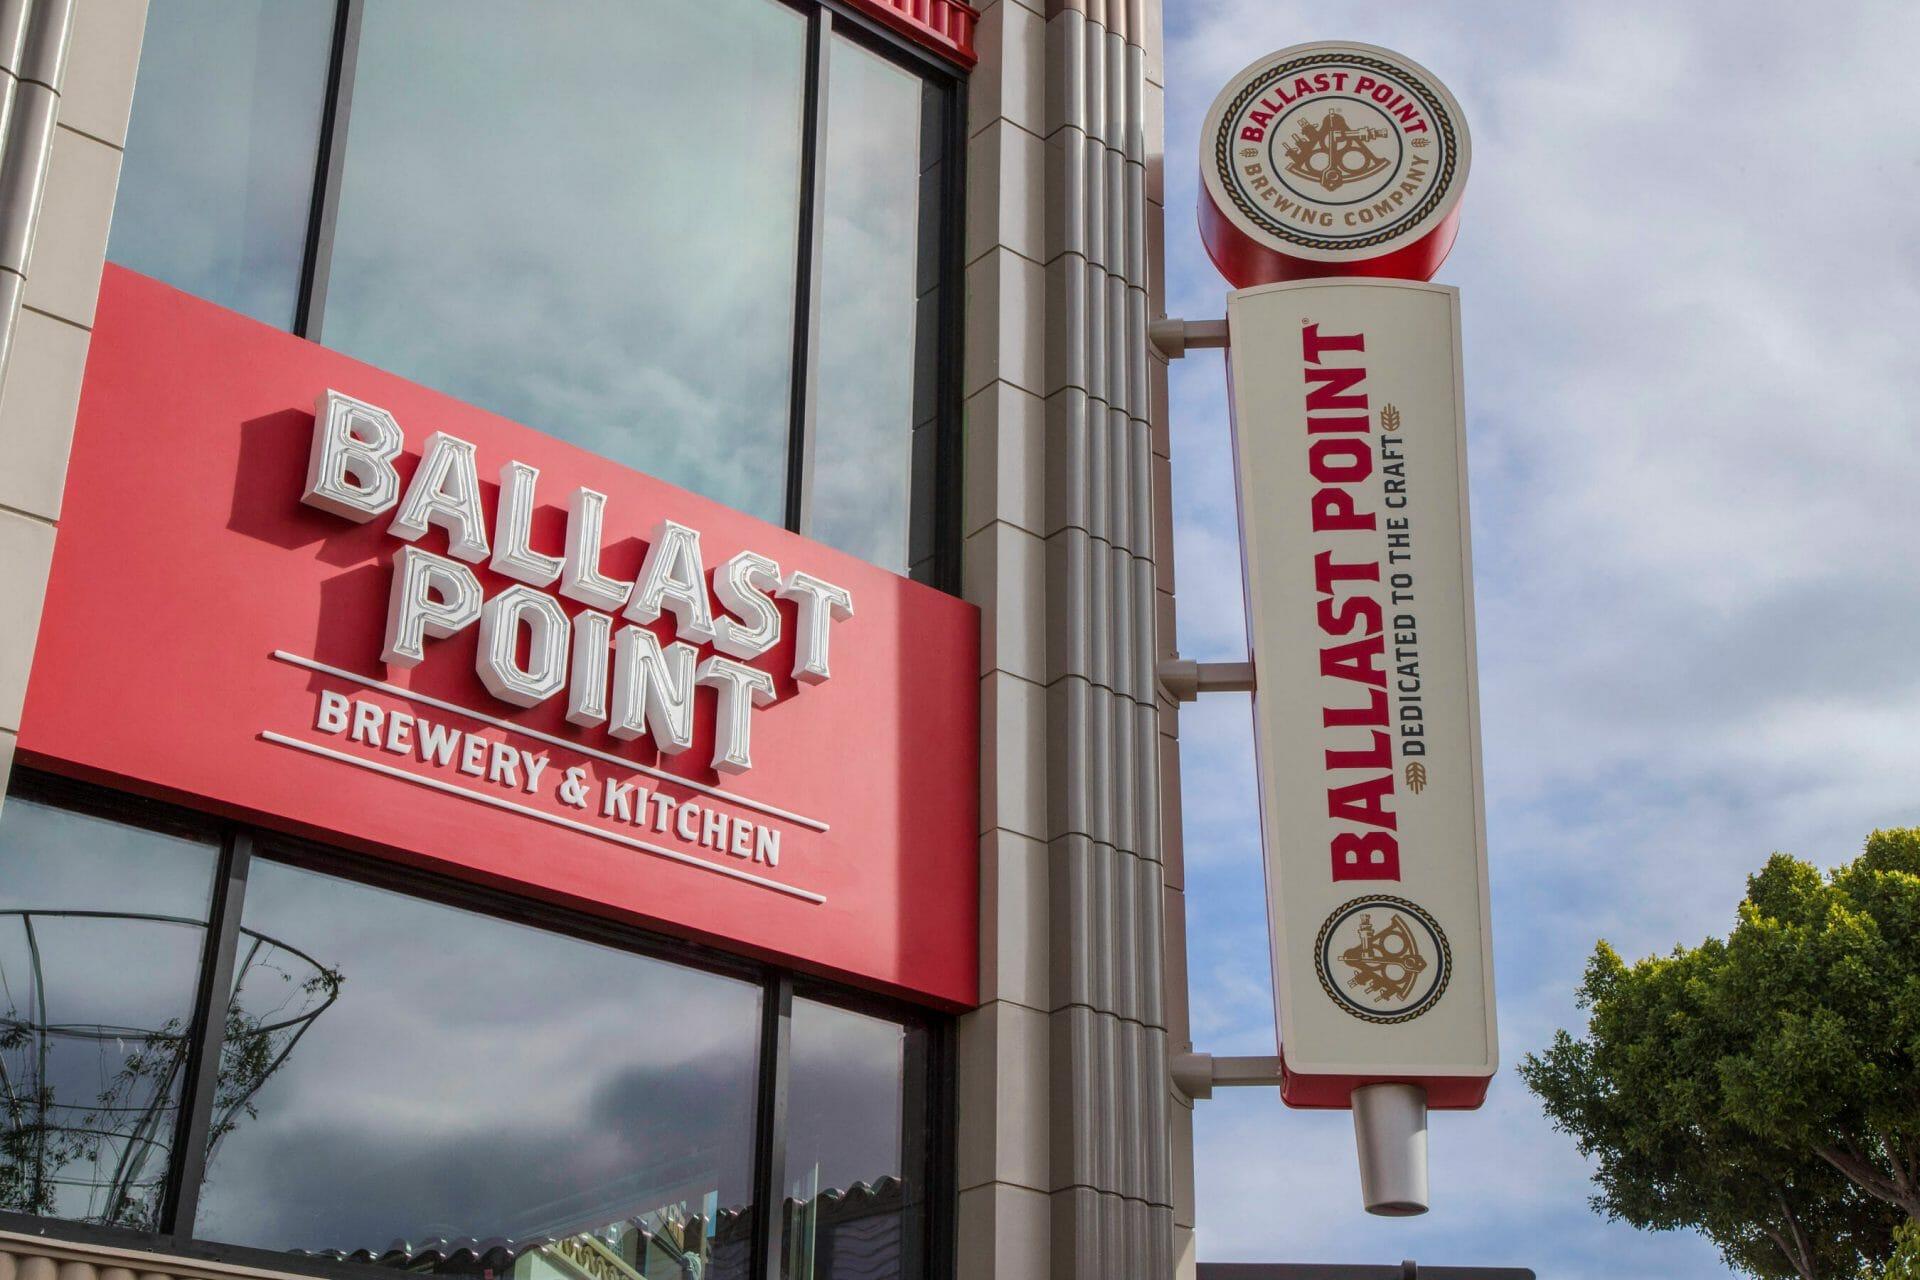 Ballast Point Brewery & Kitchen at Downtown Disney District